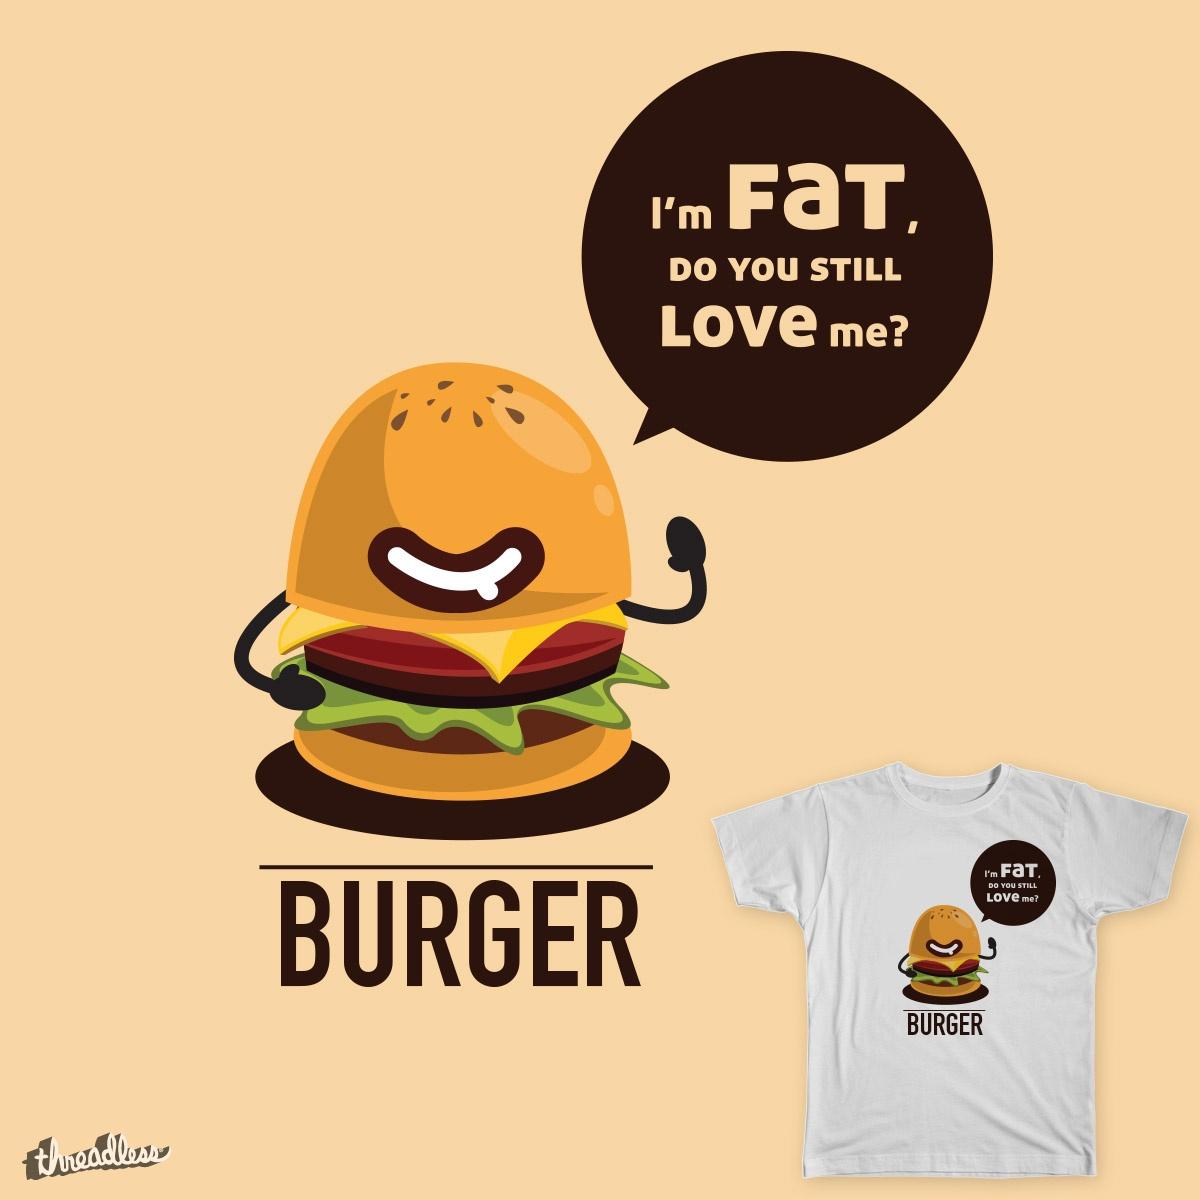 Burger by stefan.kang.1 on Threadless